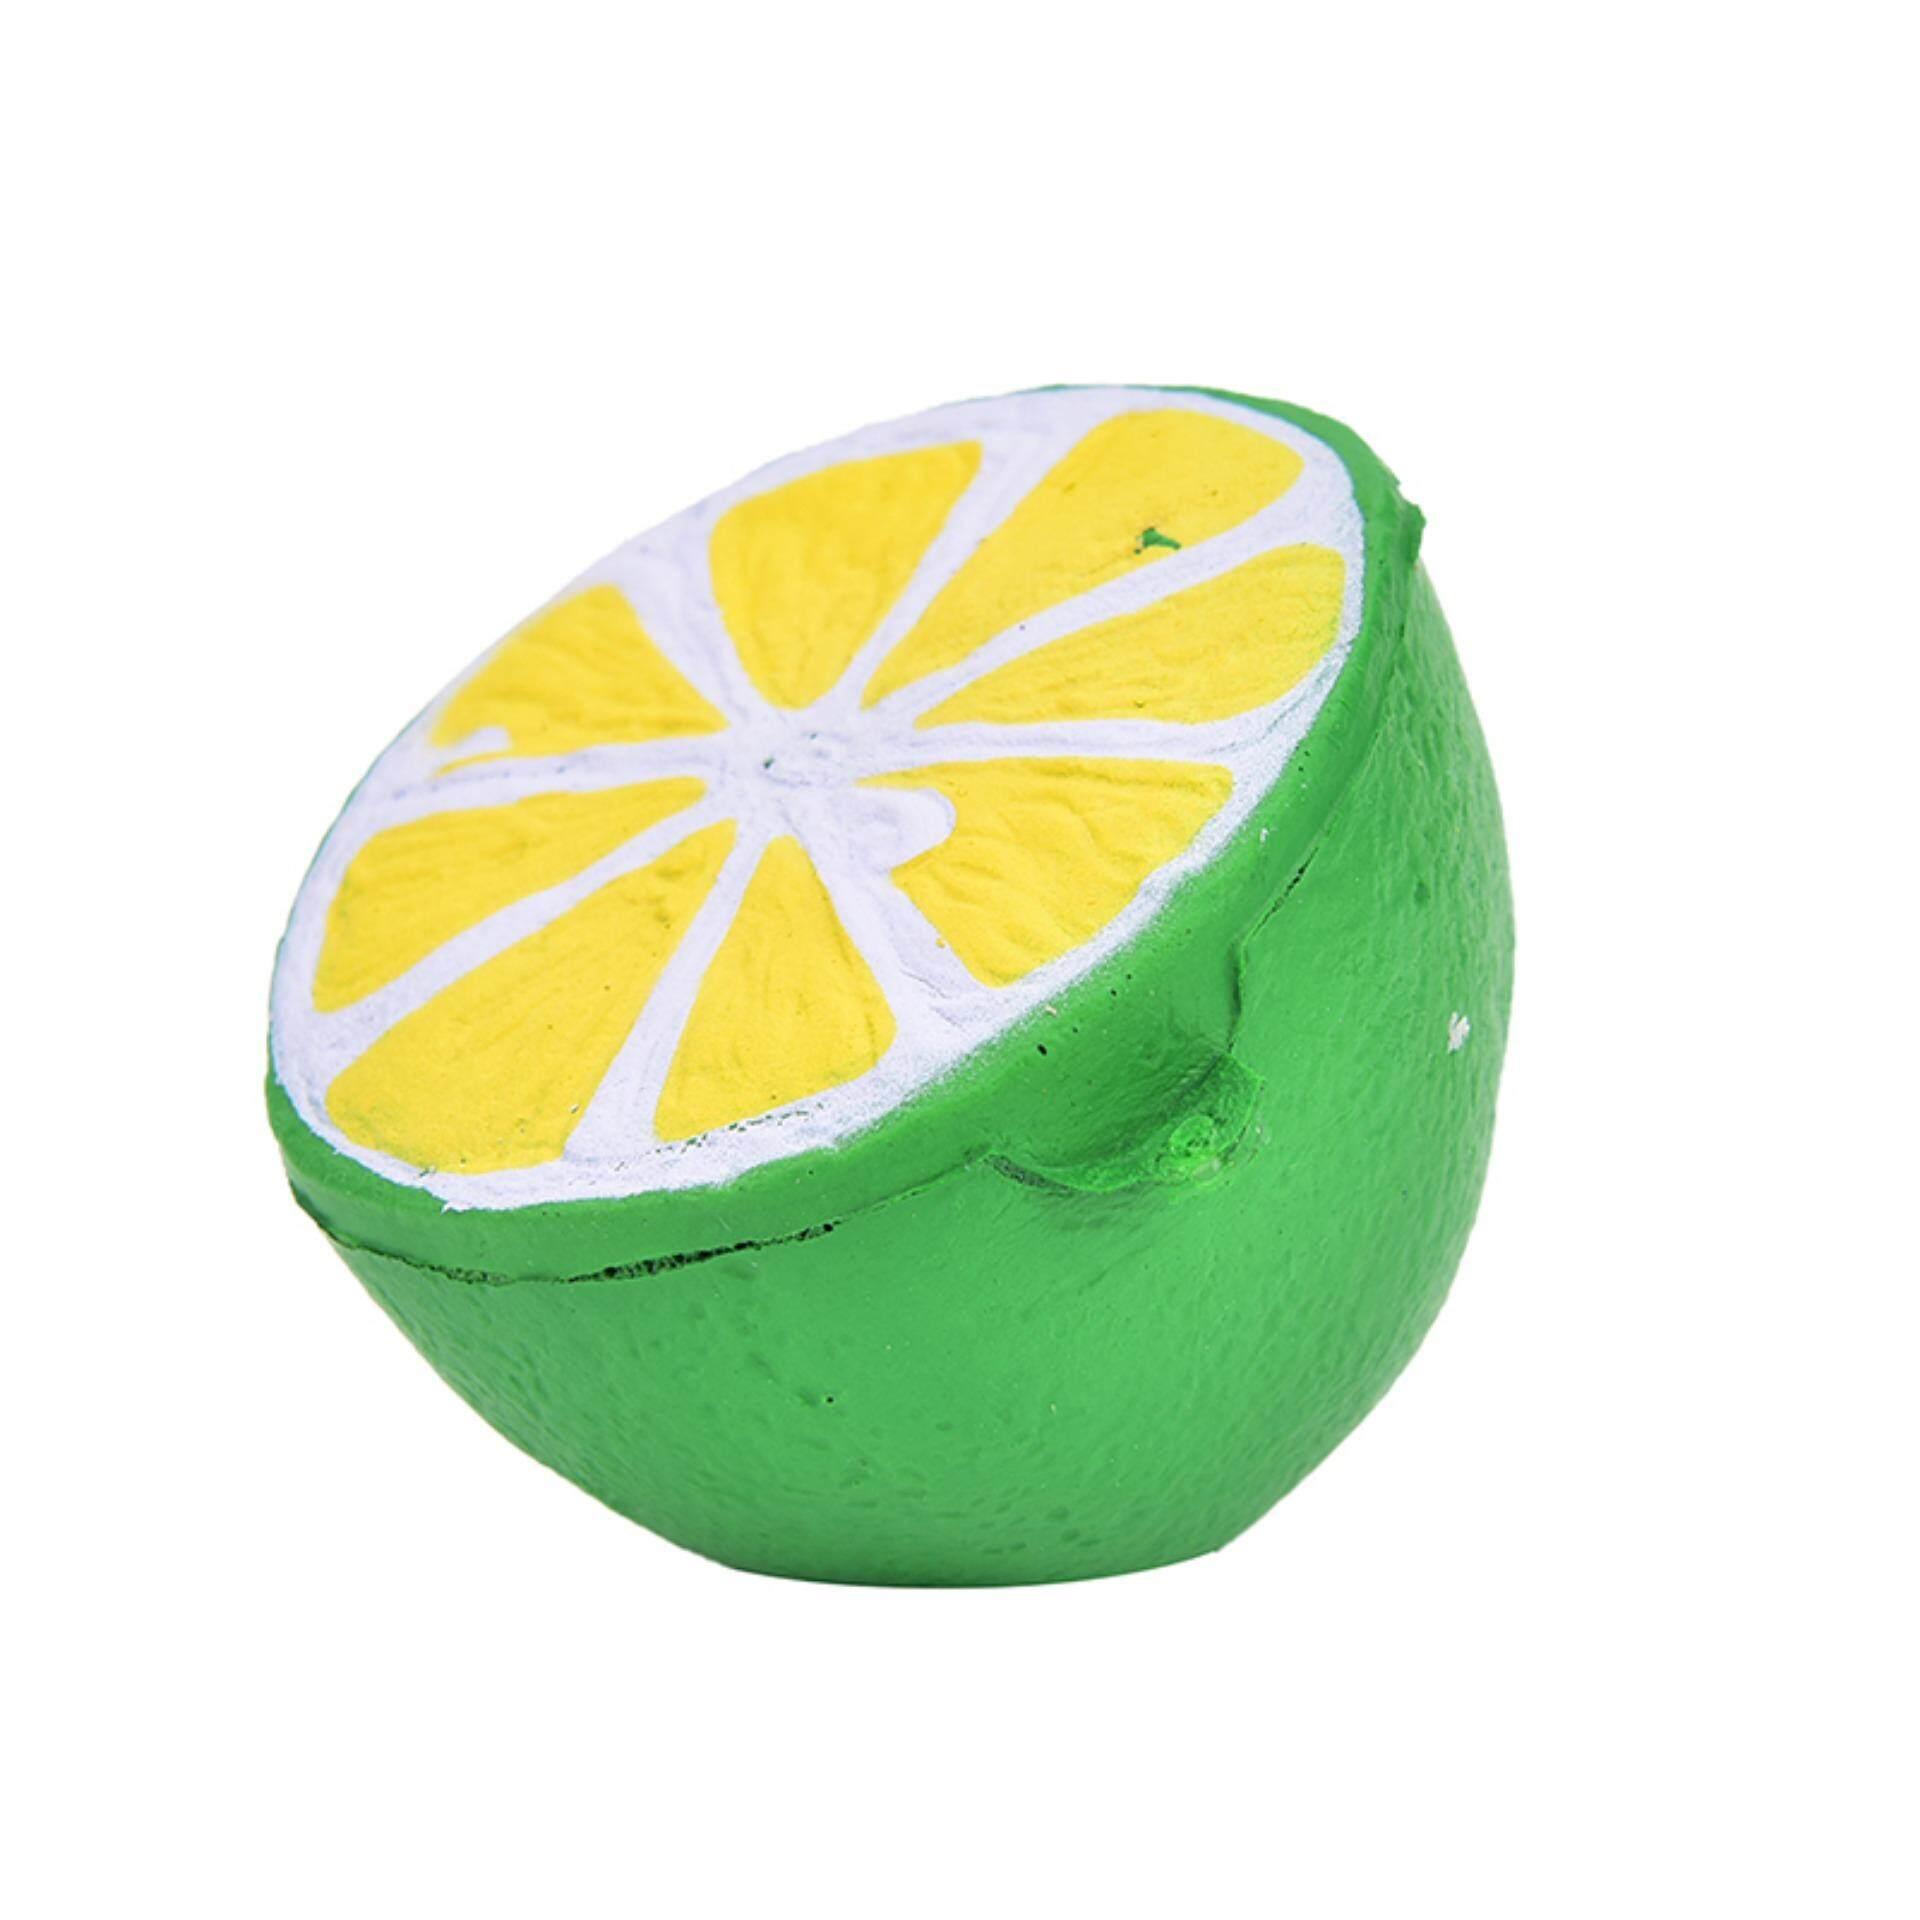 Squishy Jumbo Half Lemon Fruit Scented Super Slow Rising Keyring Kid Fun Toy Green - intl